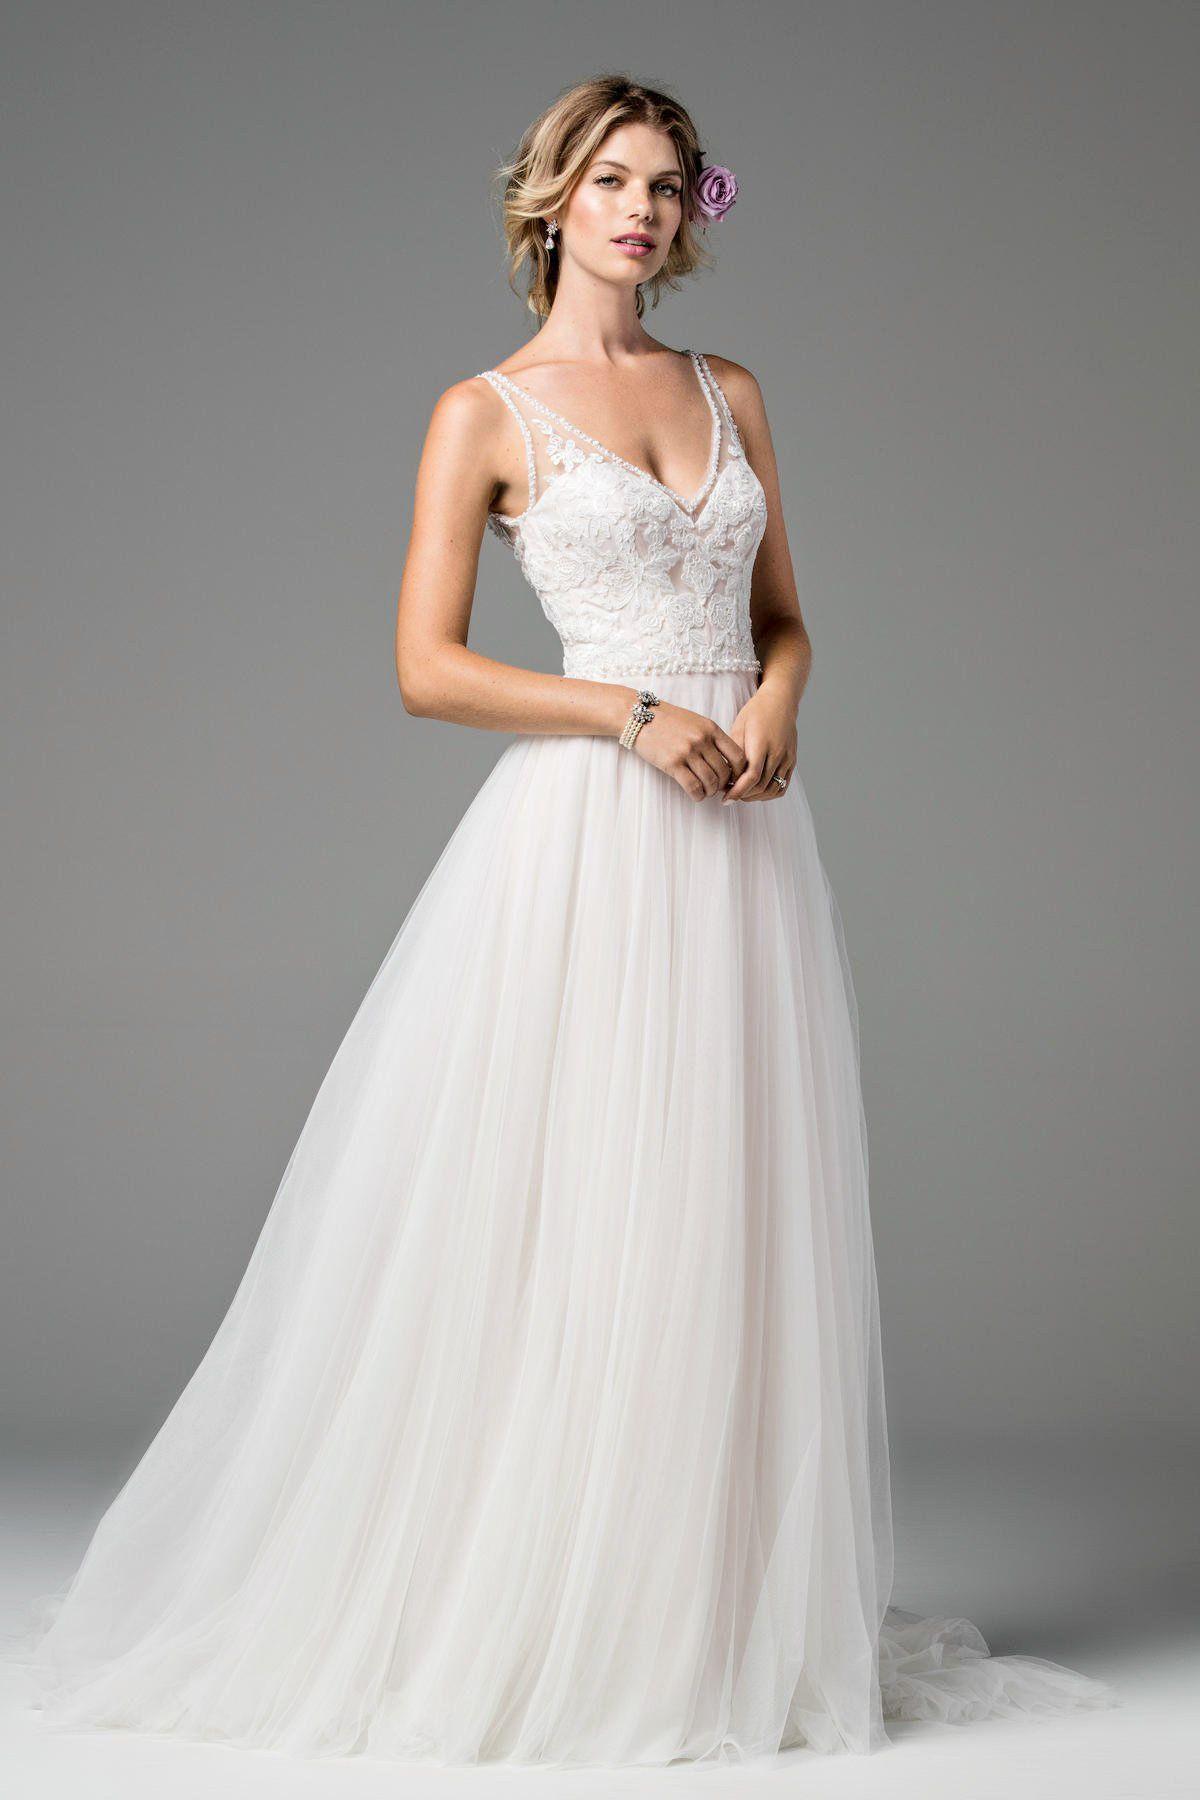 WTOO Locklin, blush | Wedding: The Dress | Pinterest | Brautkleider